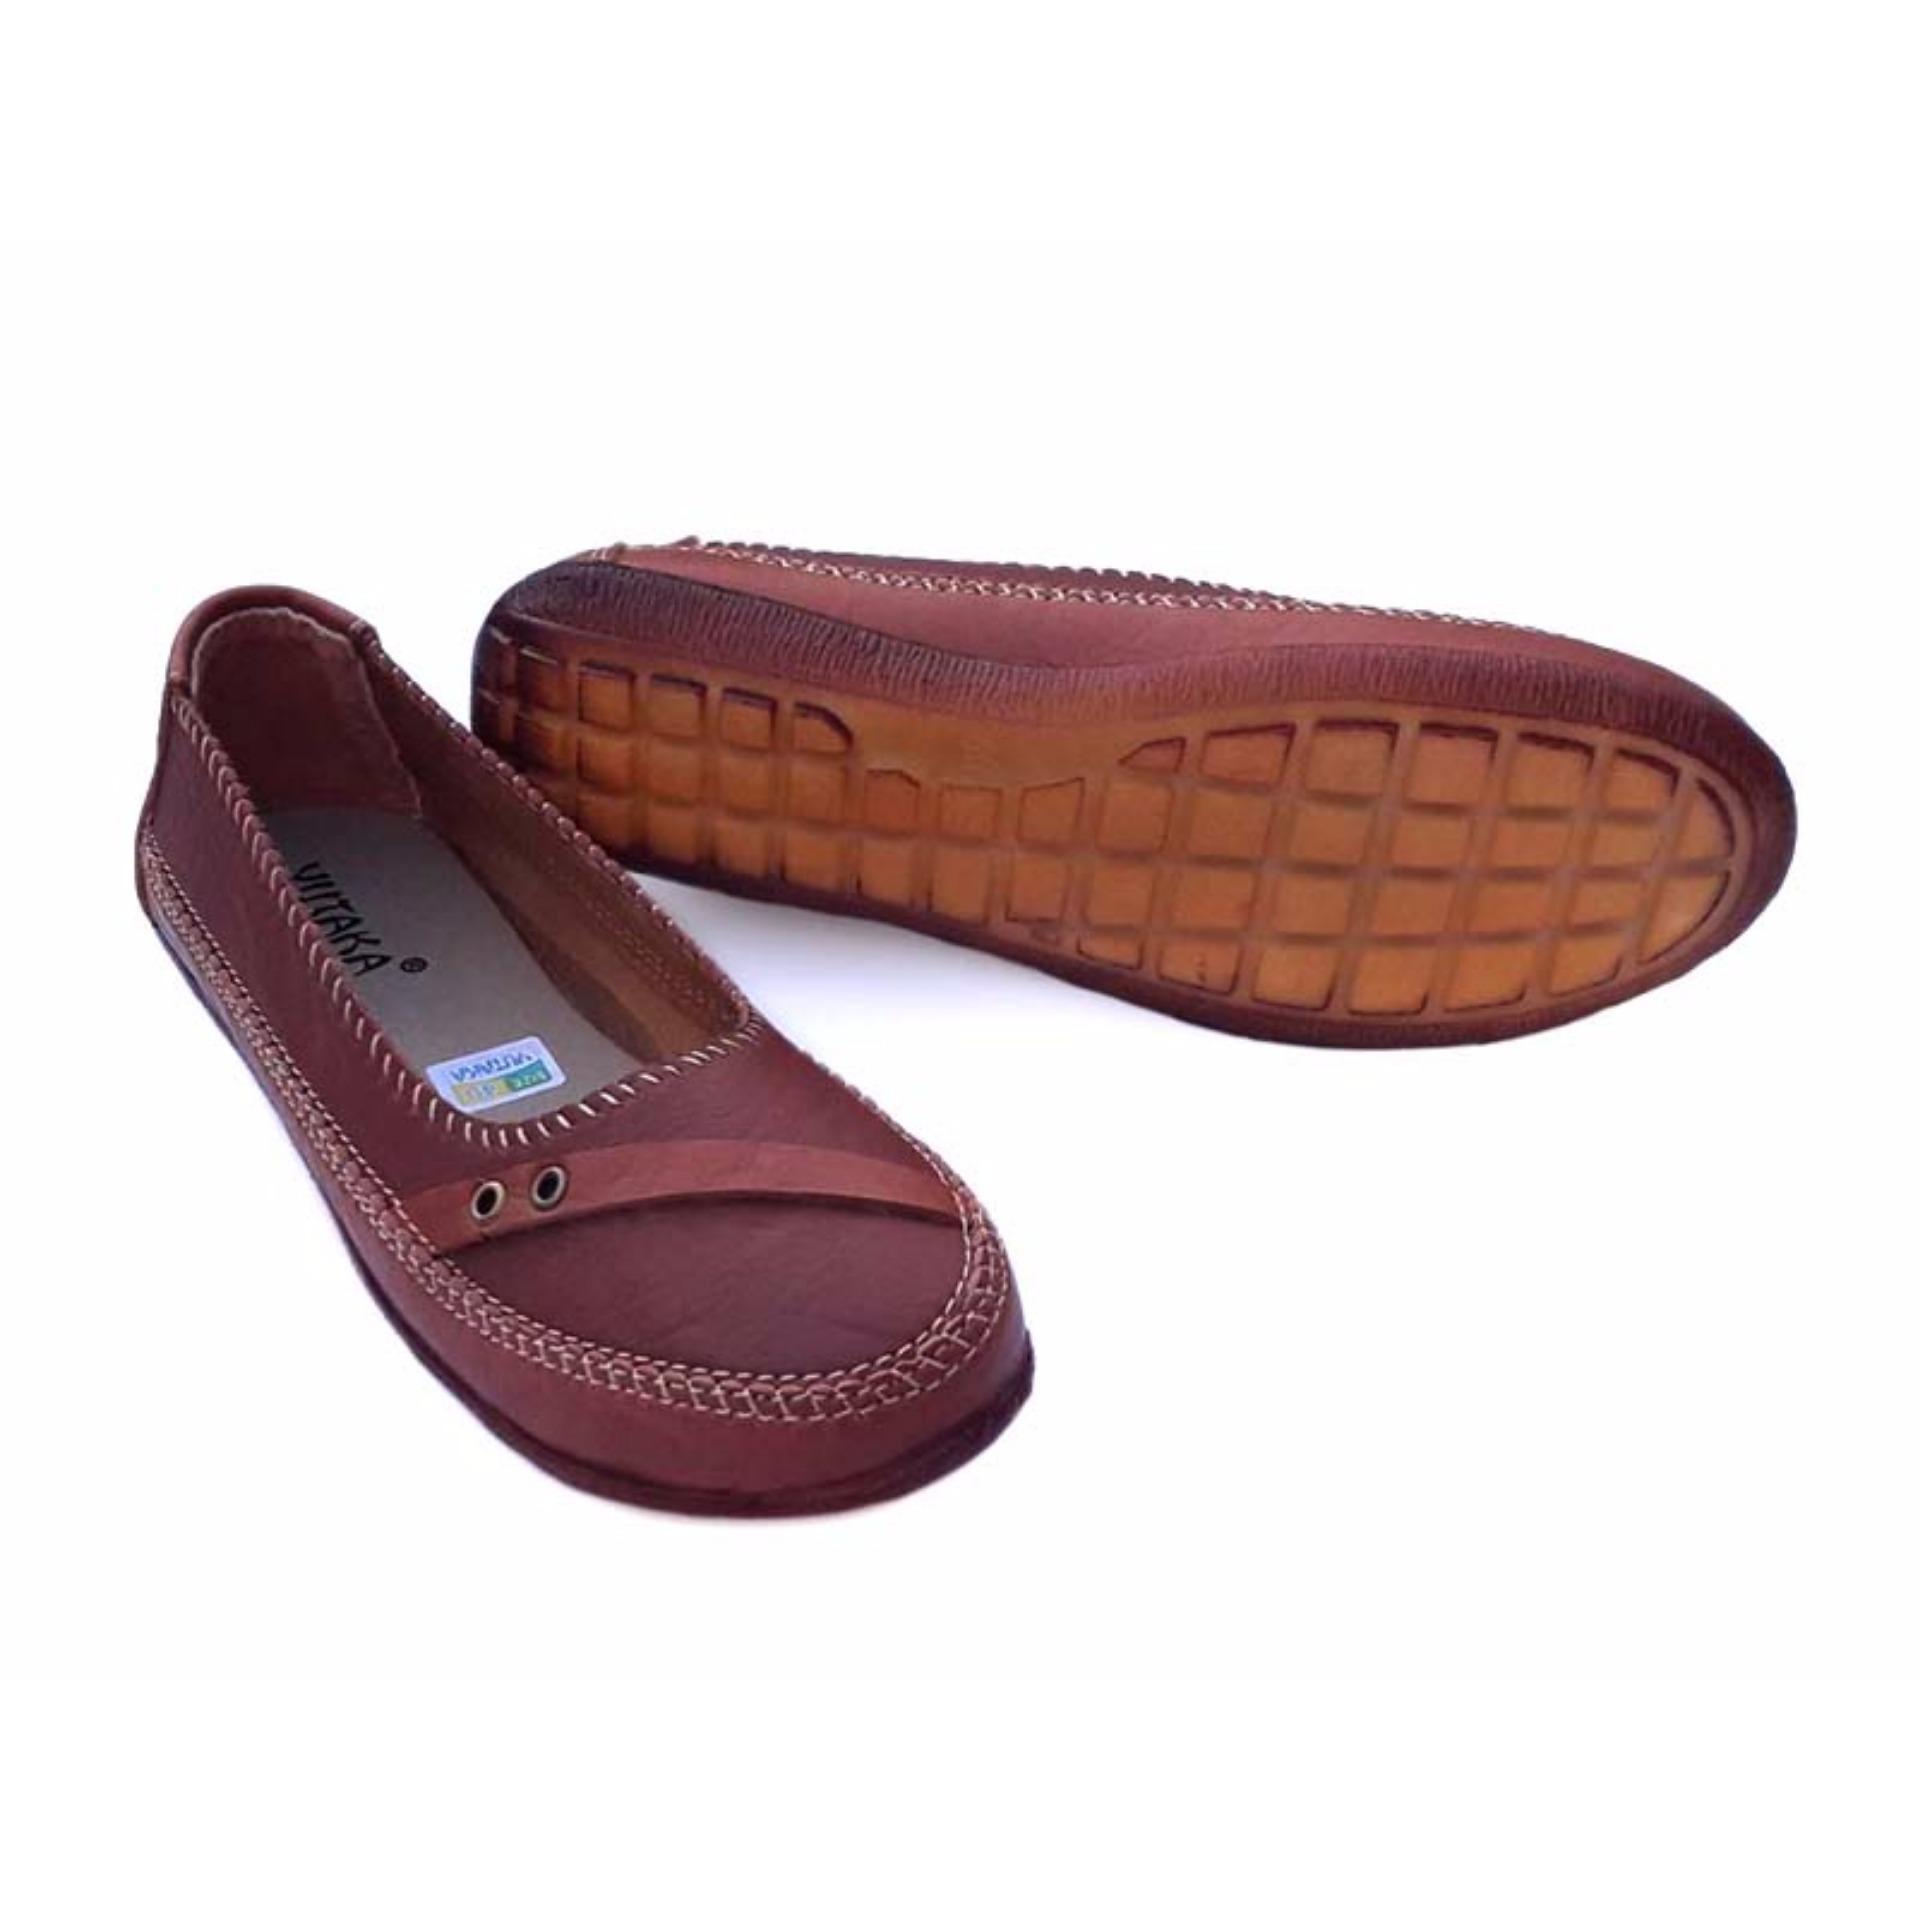 Yutaka flat shoes SK01 - Tan .